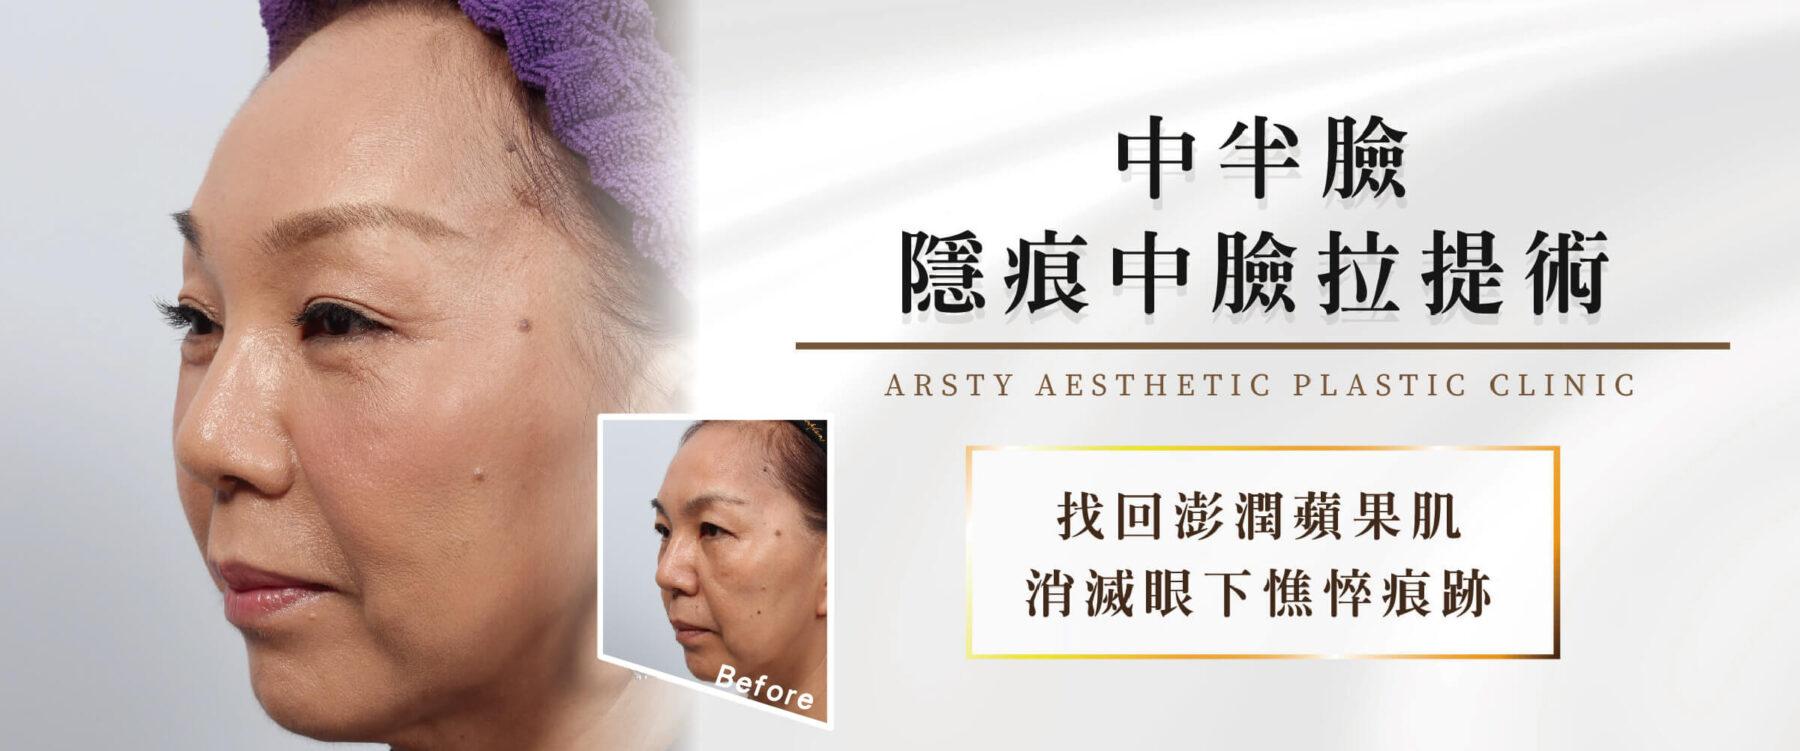 中半臉:隱痕中臉拉提術Banner2